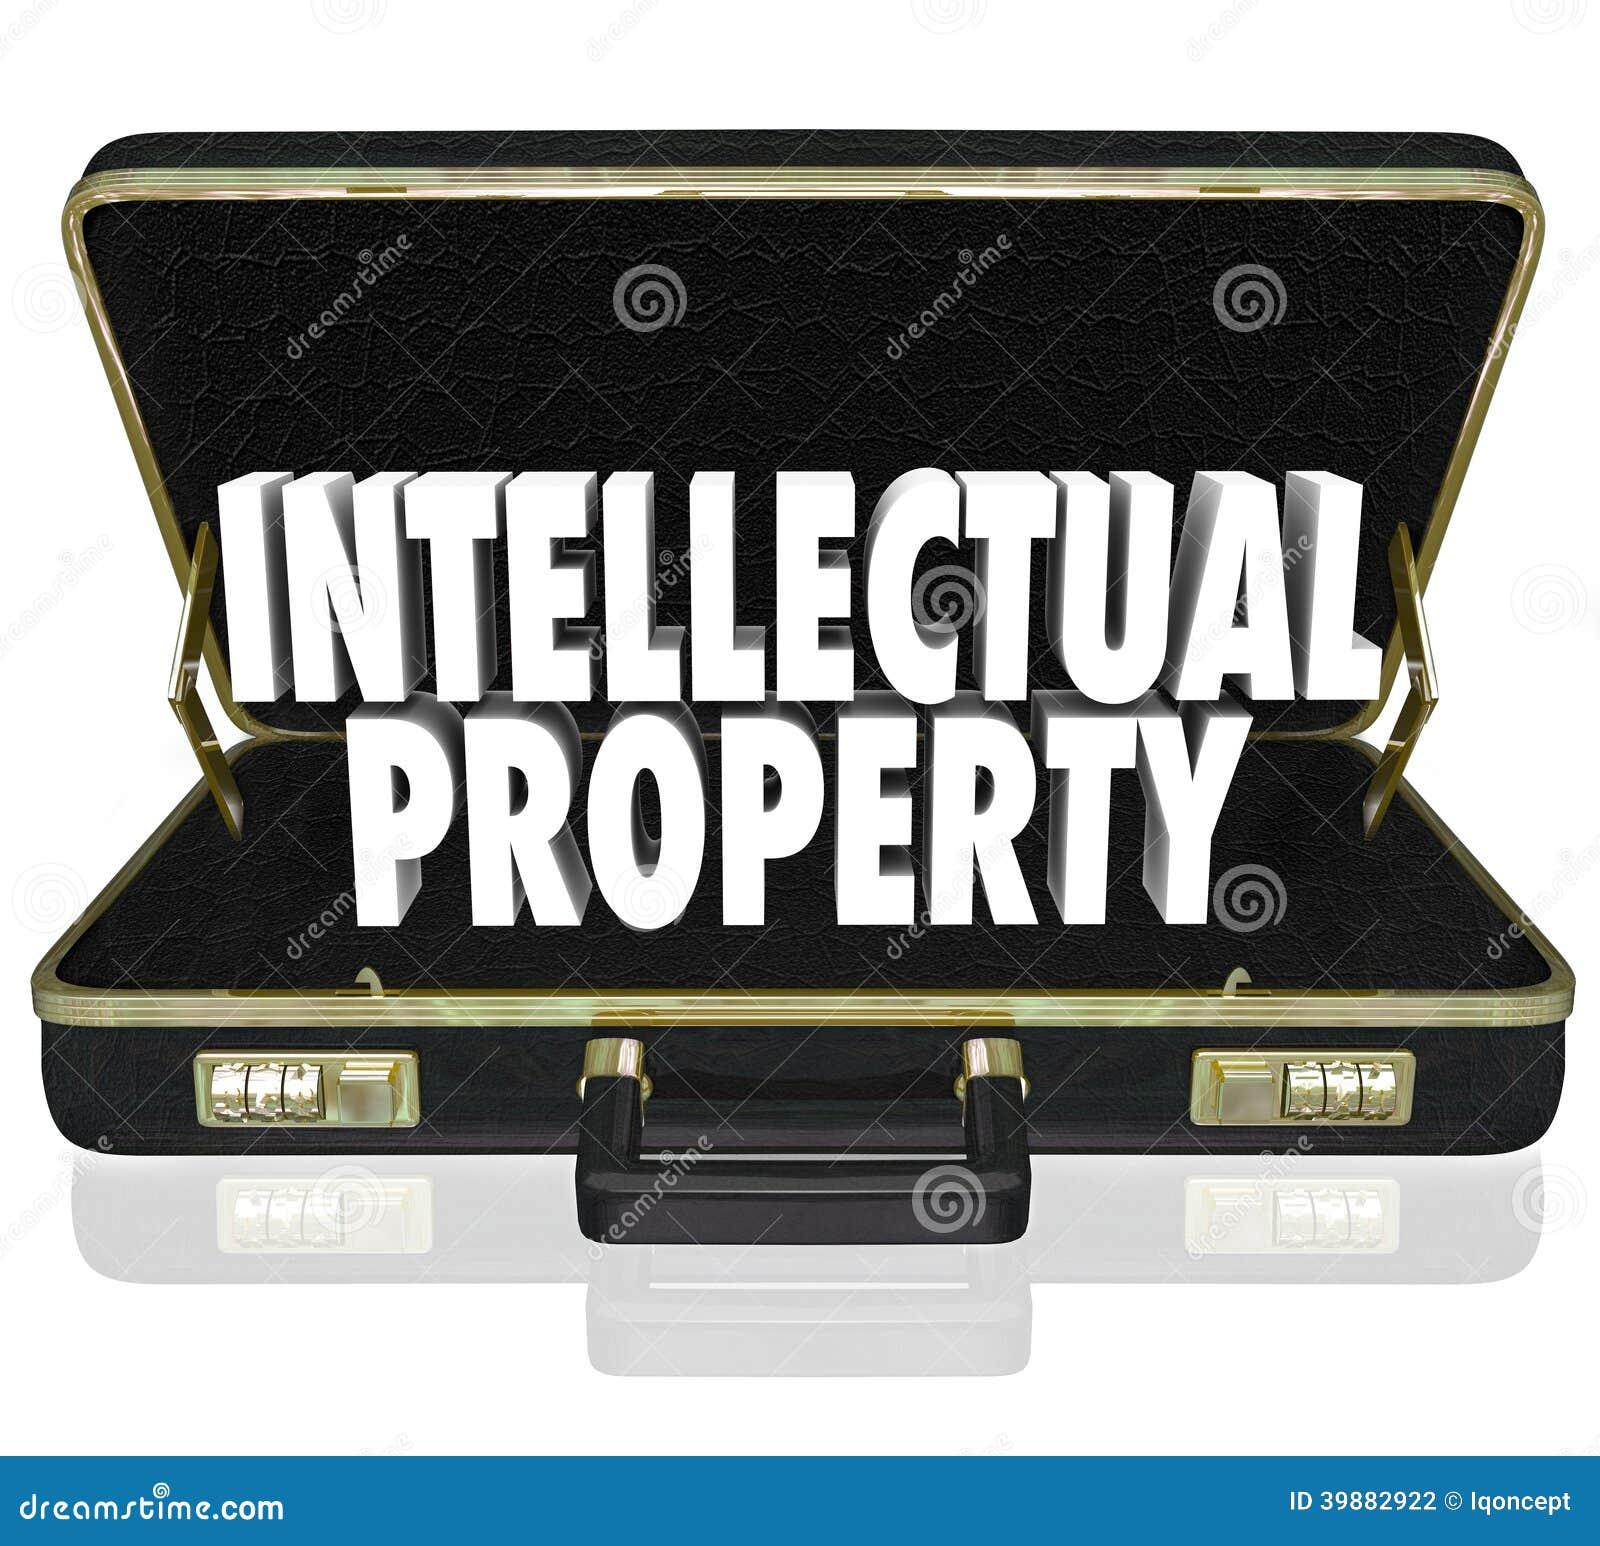 Intellectual Property: Intellectual Property Words Briefcase Business License